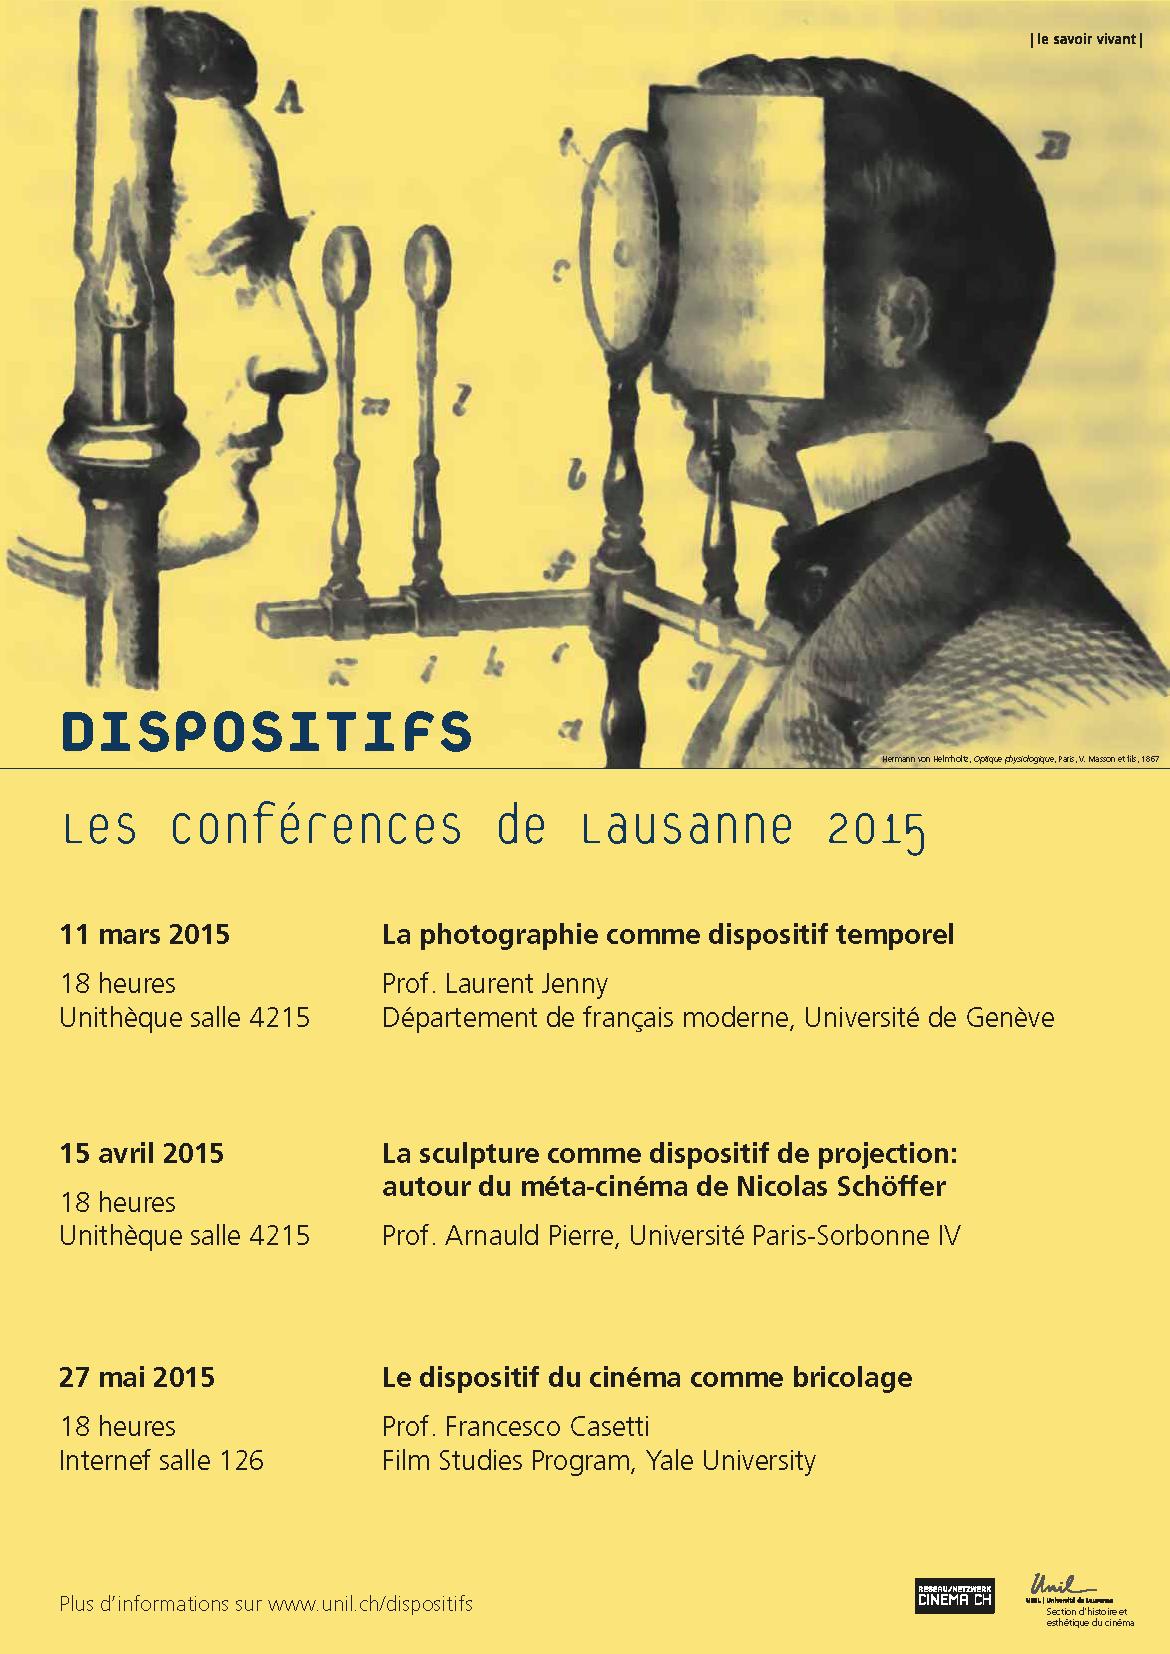 Dispositifs 2015